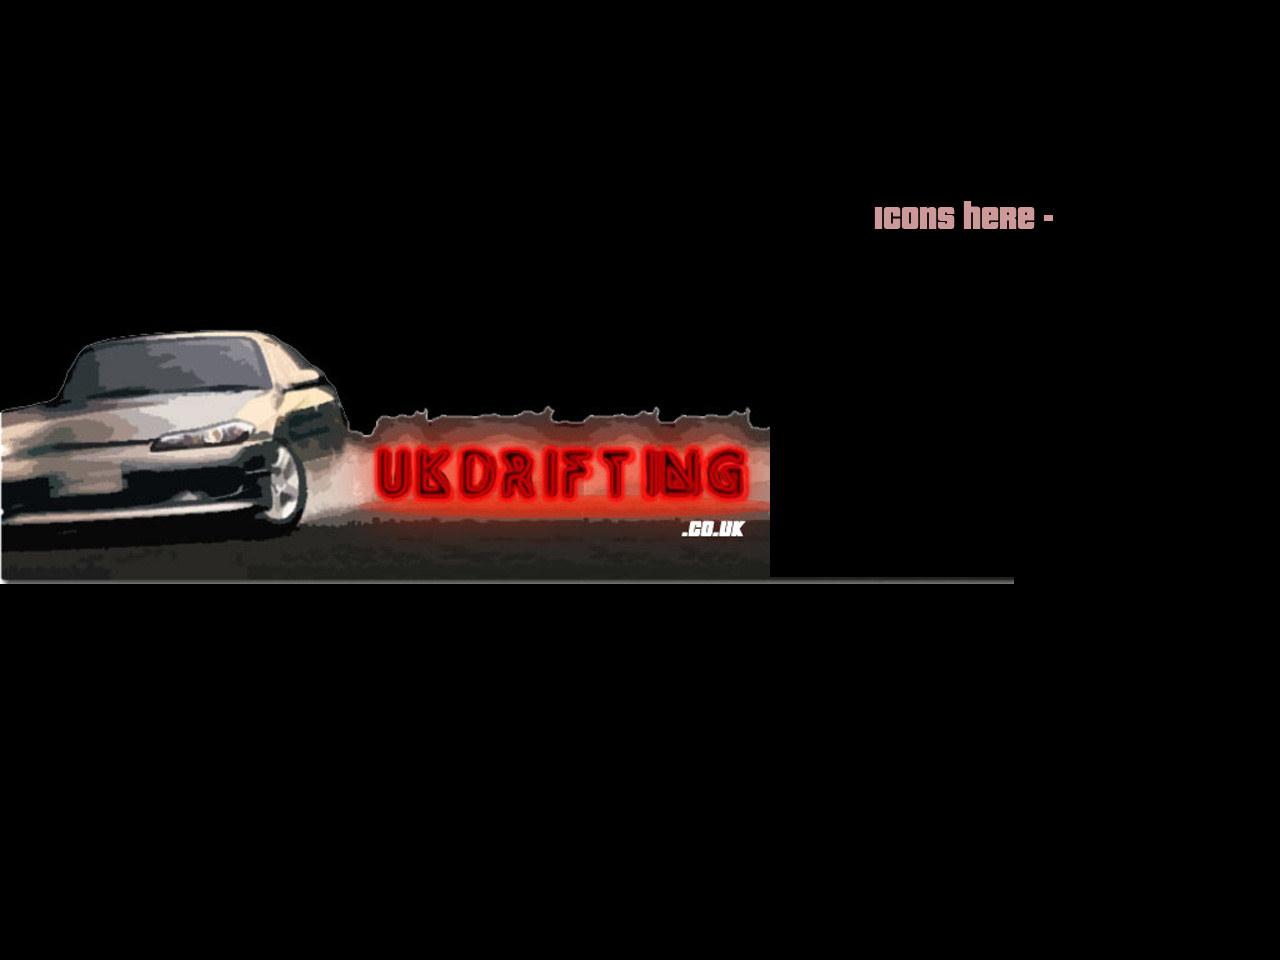 UK Drifting wallpaper featuring an Nissan Silvia and the UK Drifting 1280x960